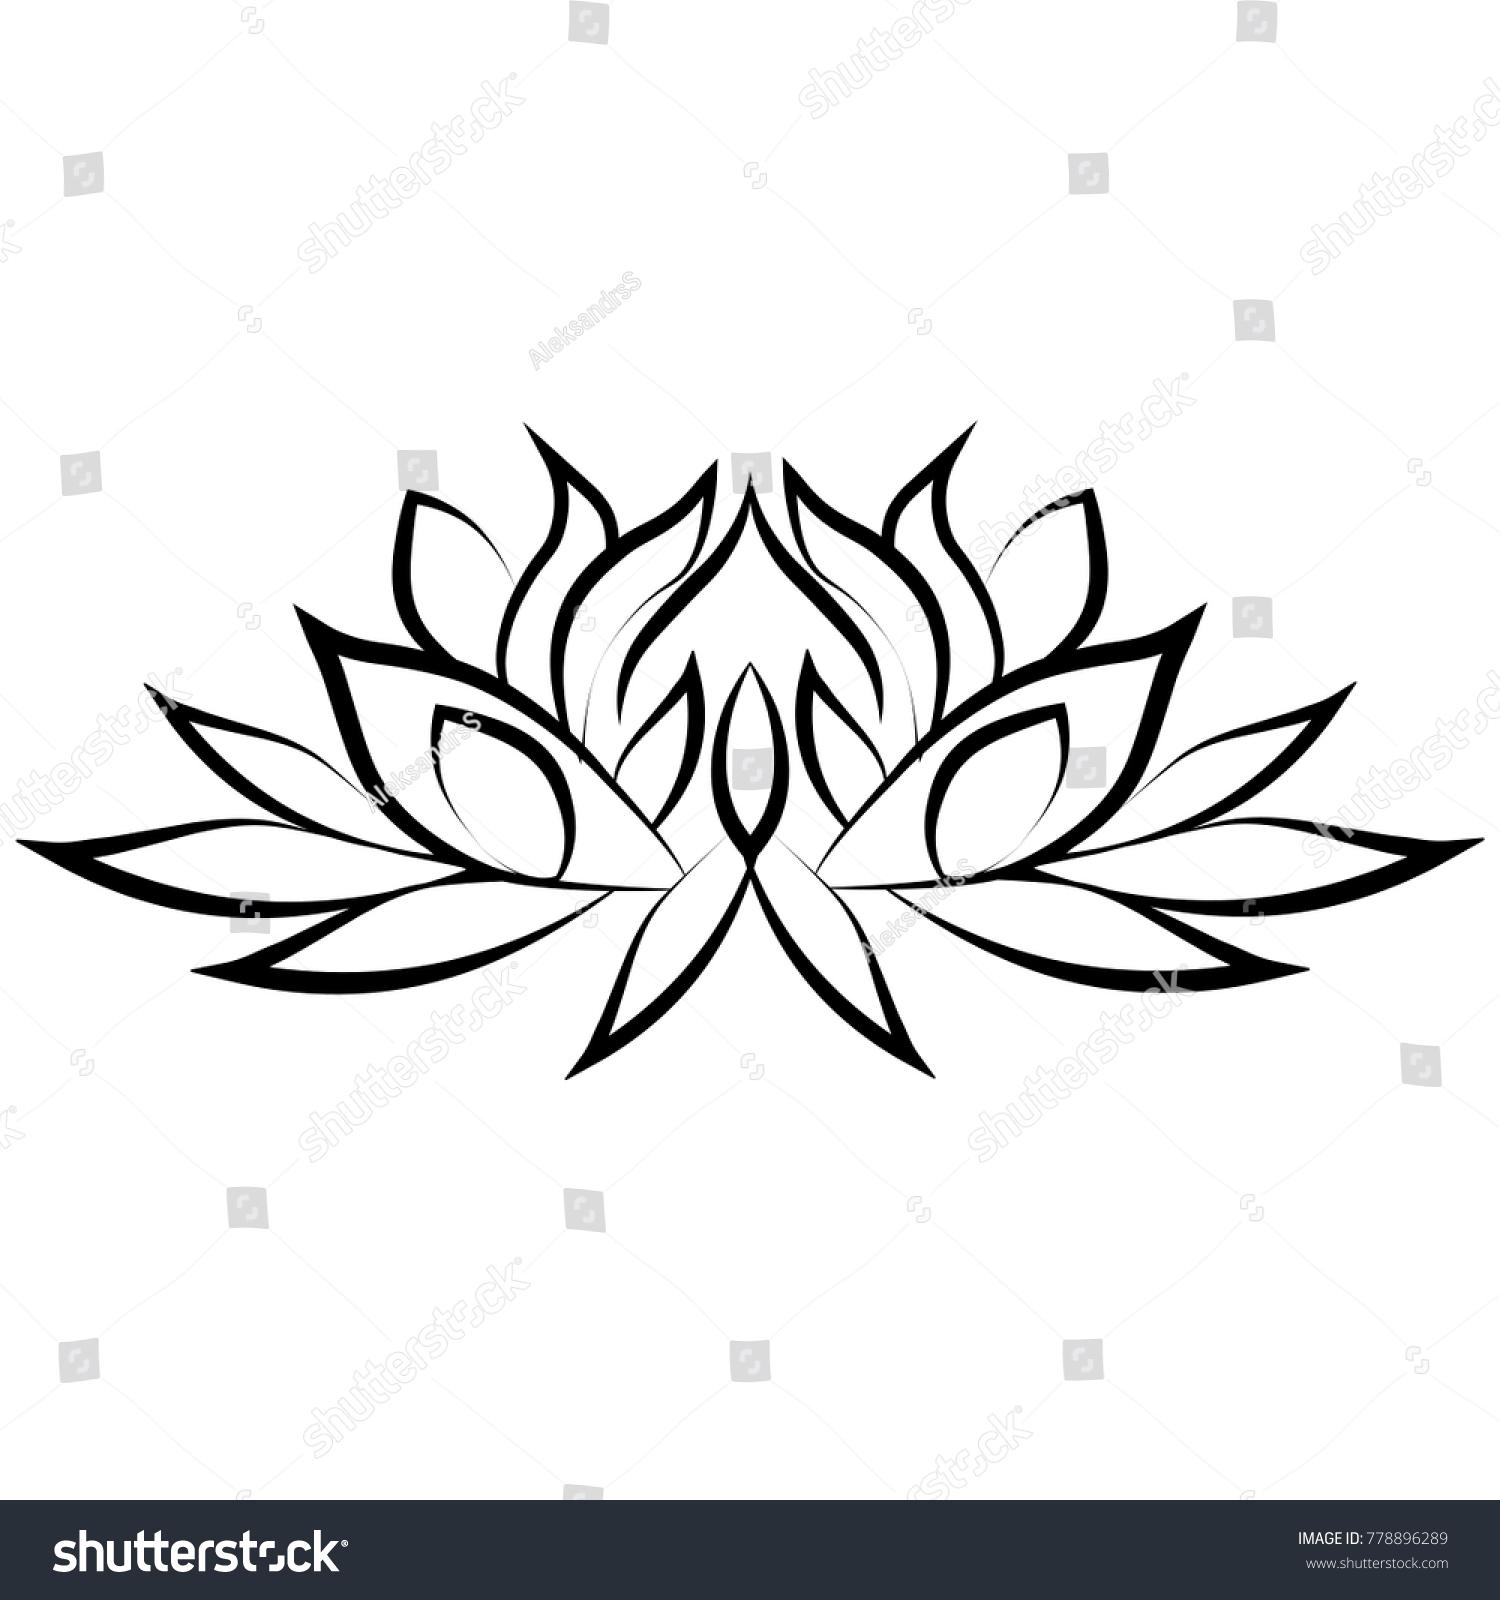 Lotus Flower Silhouette Stock Vector Royalty Free 778896289